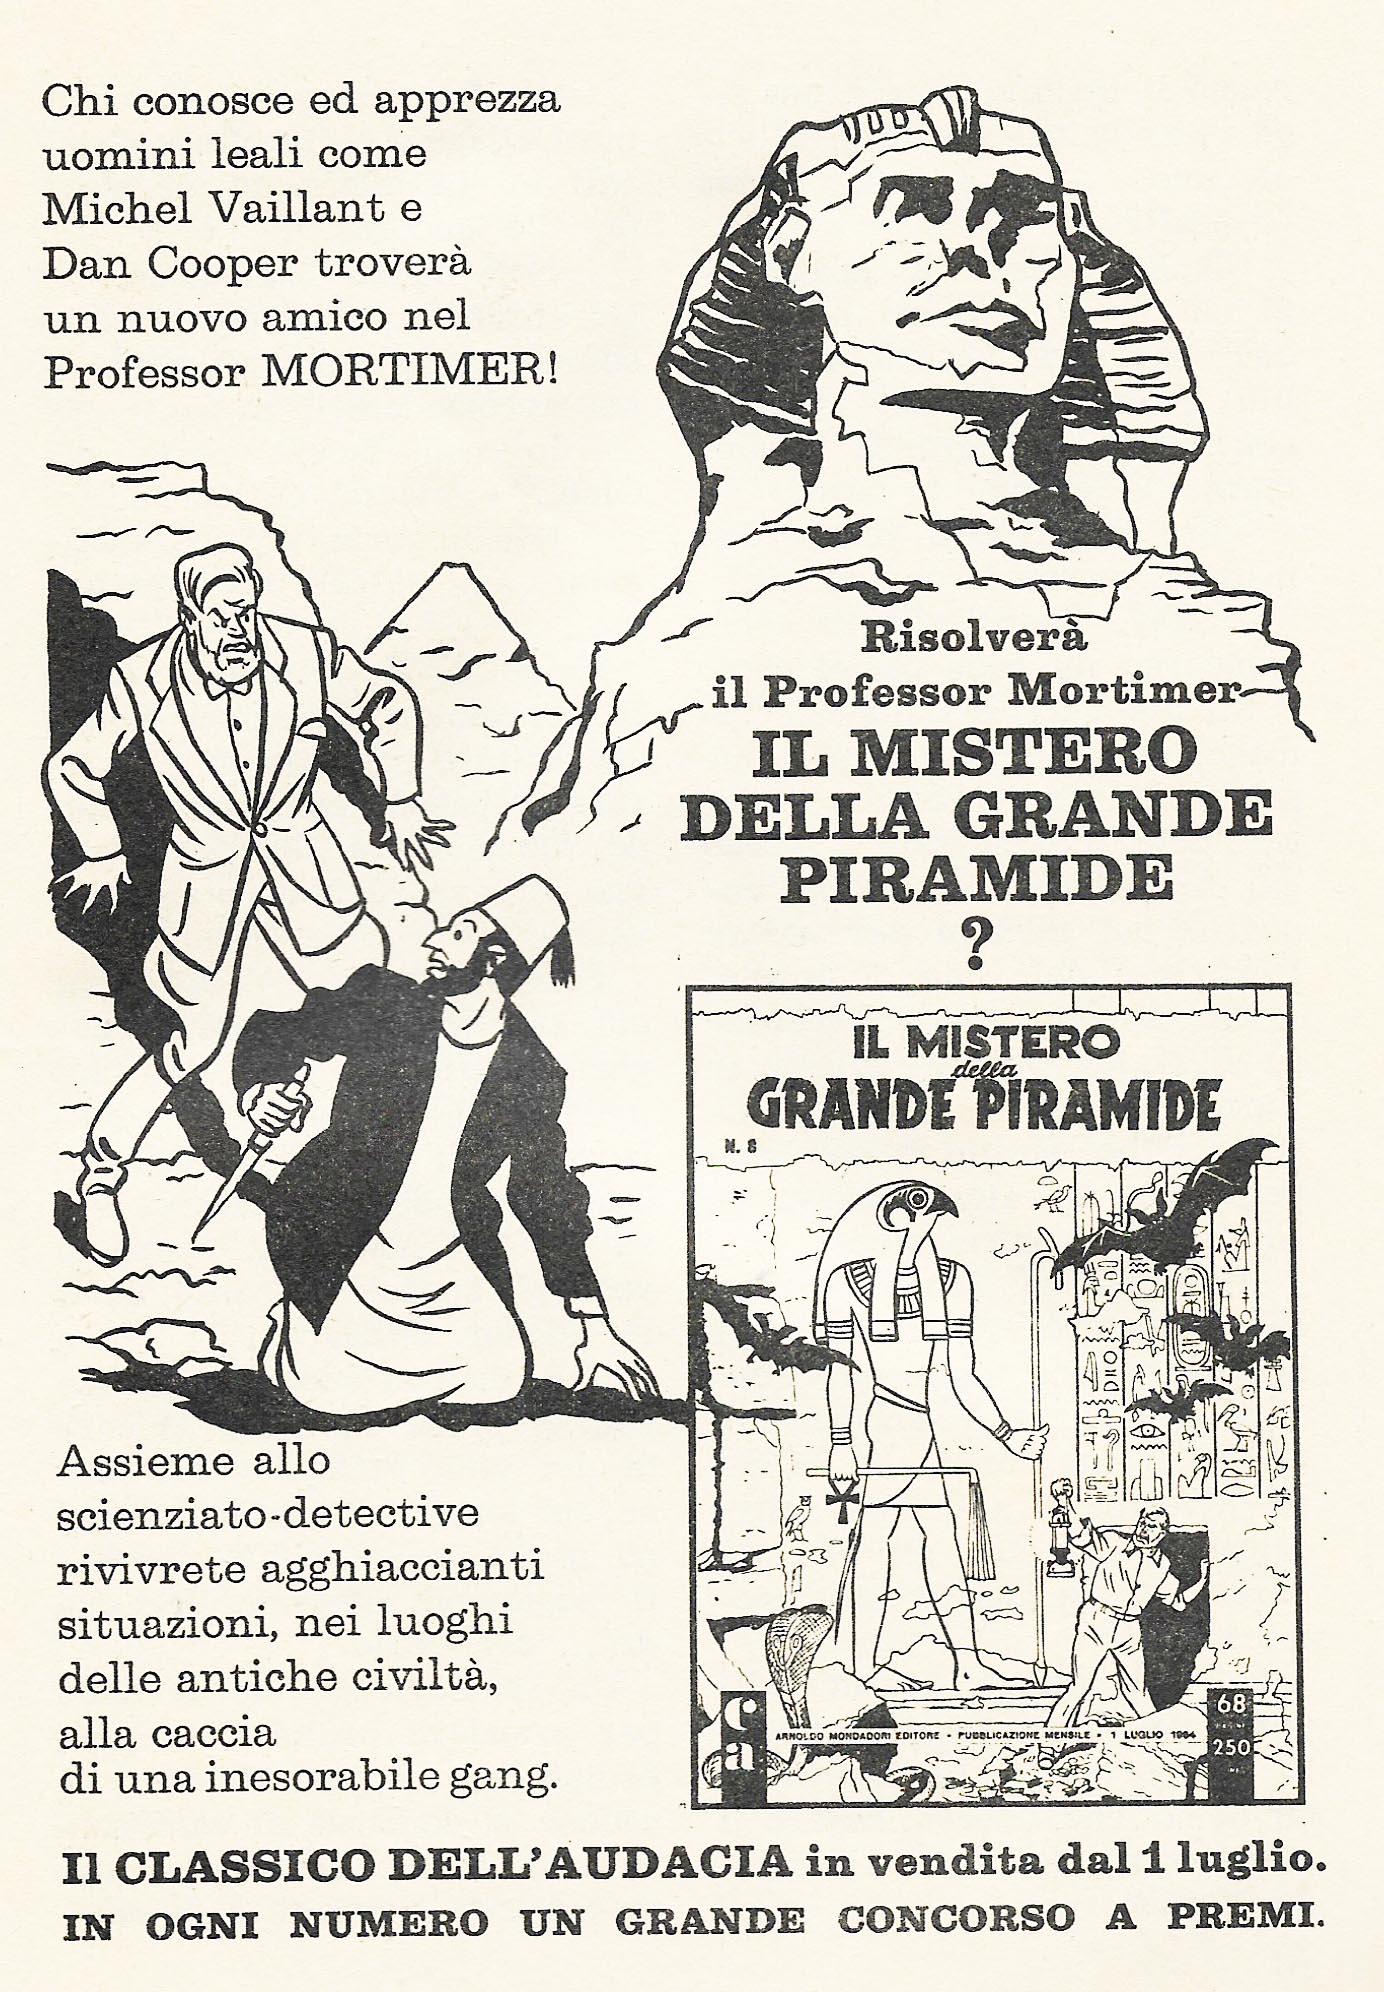 Vintage ADV Blake & Mortimer